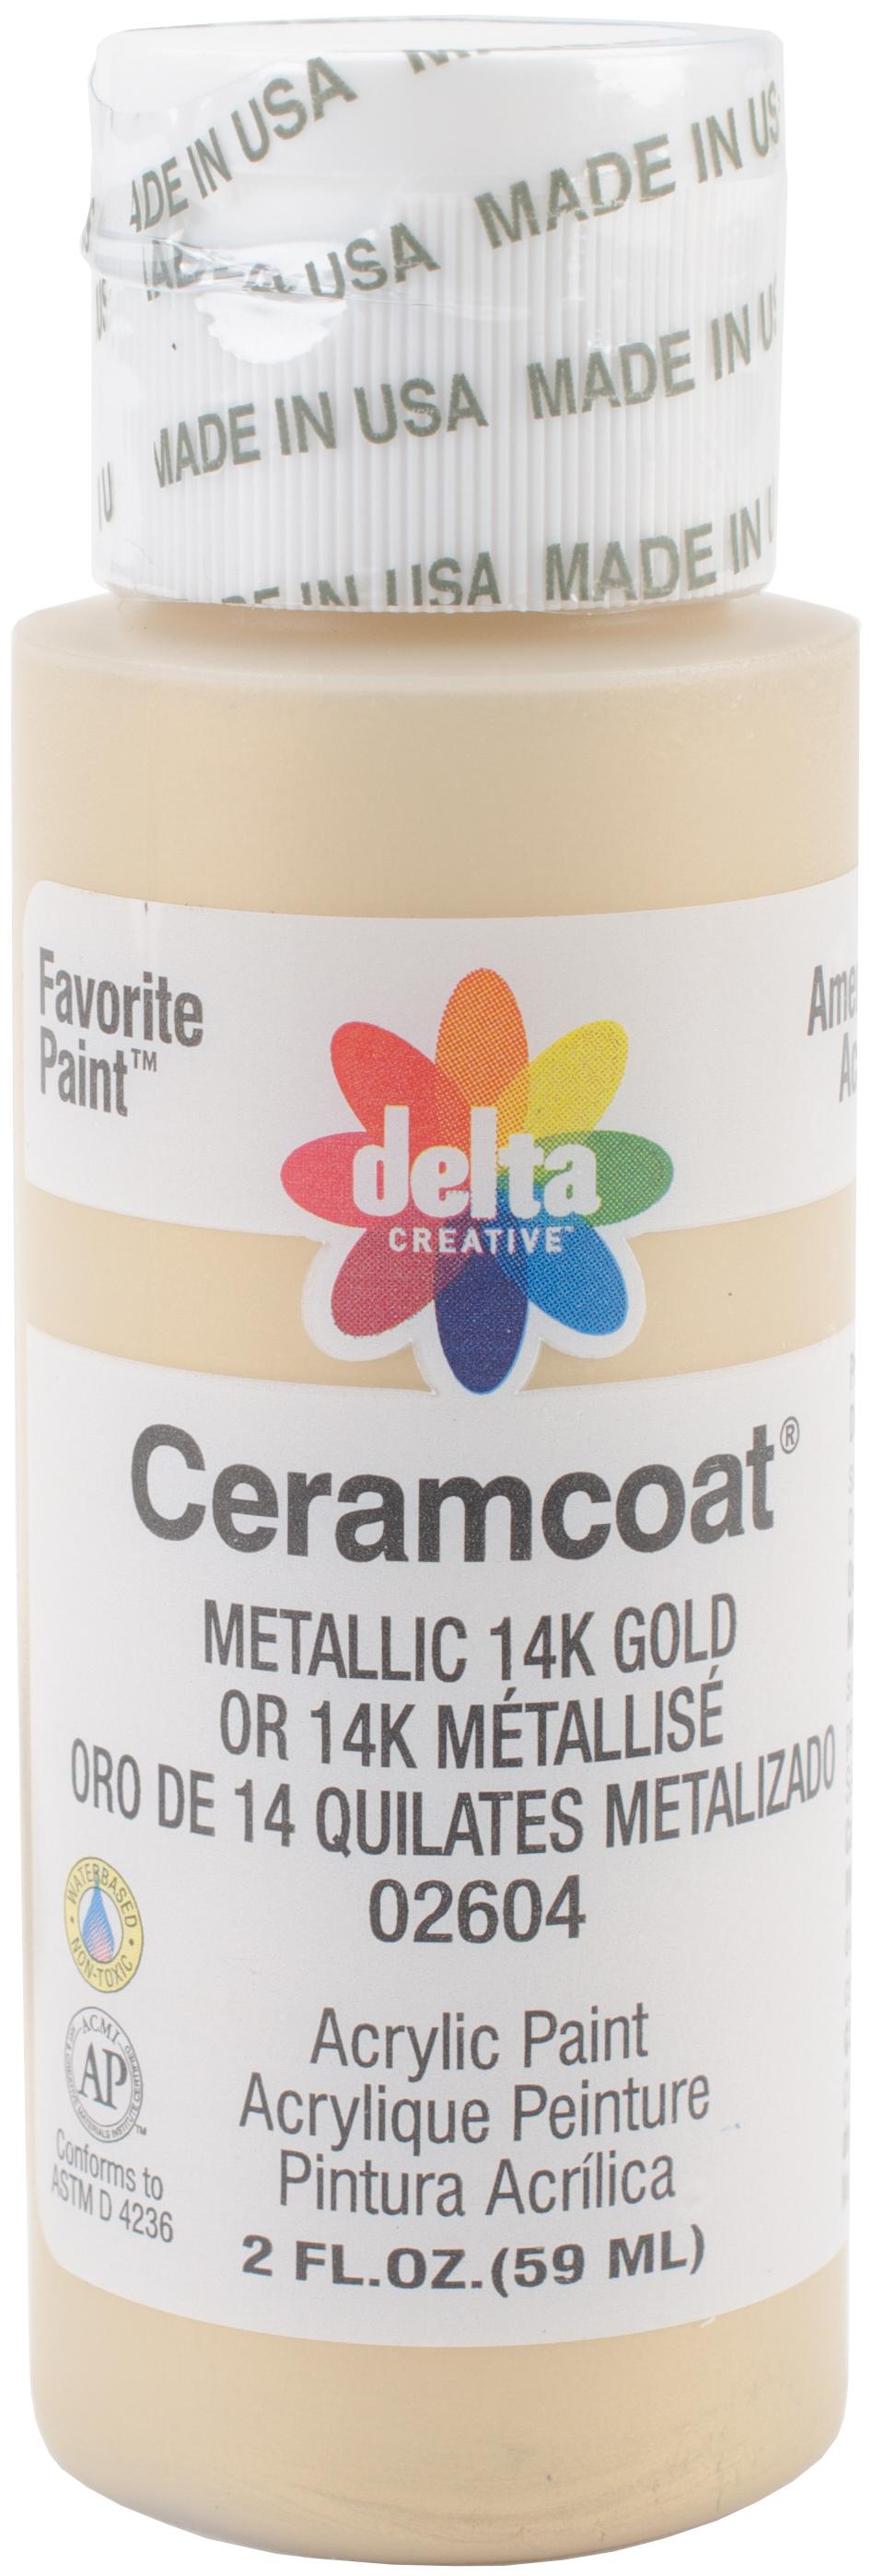 Ceramcoat Metallic Acrylic Paint 2oz-Metallic 14K Gold